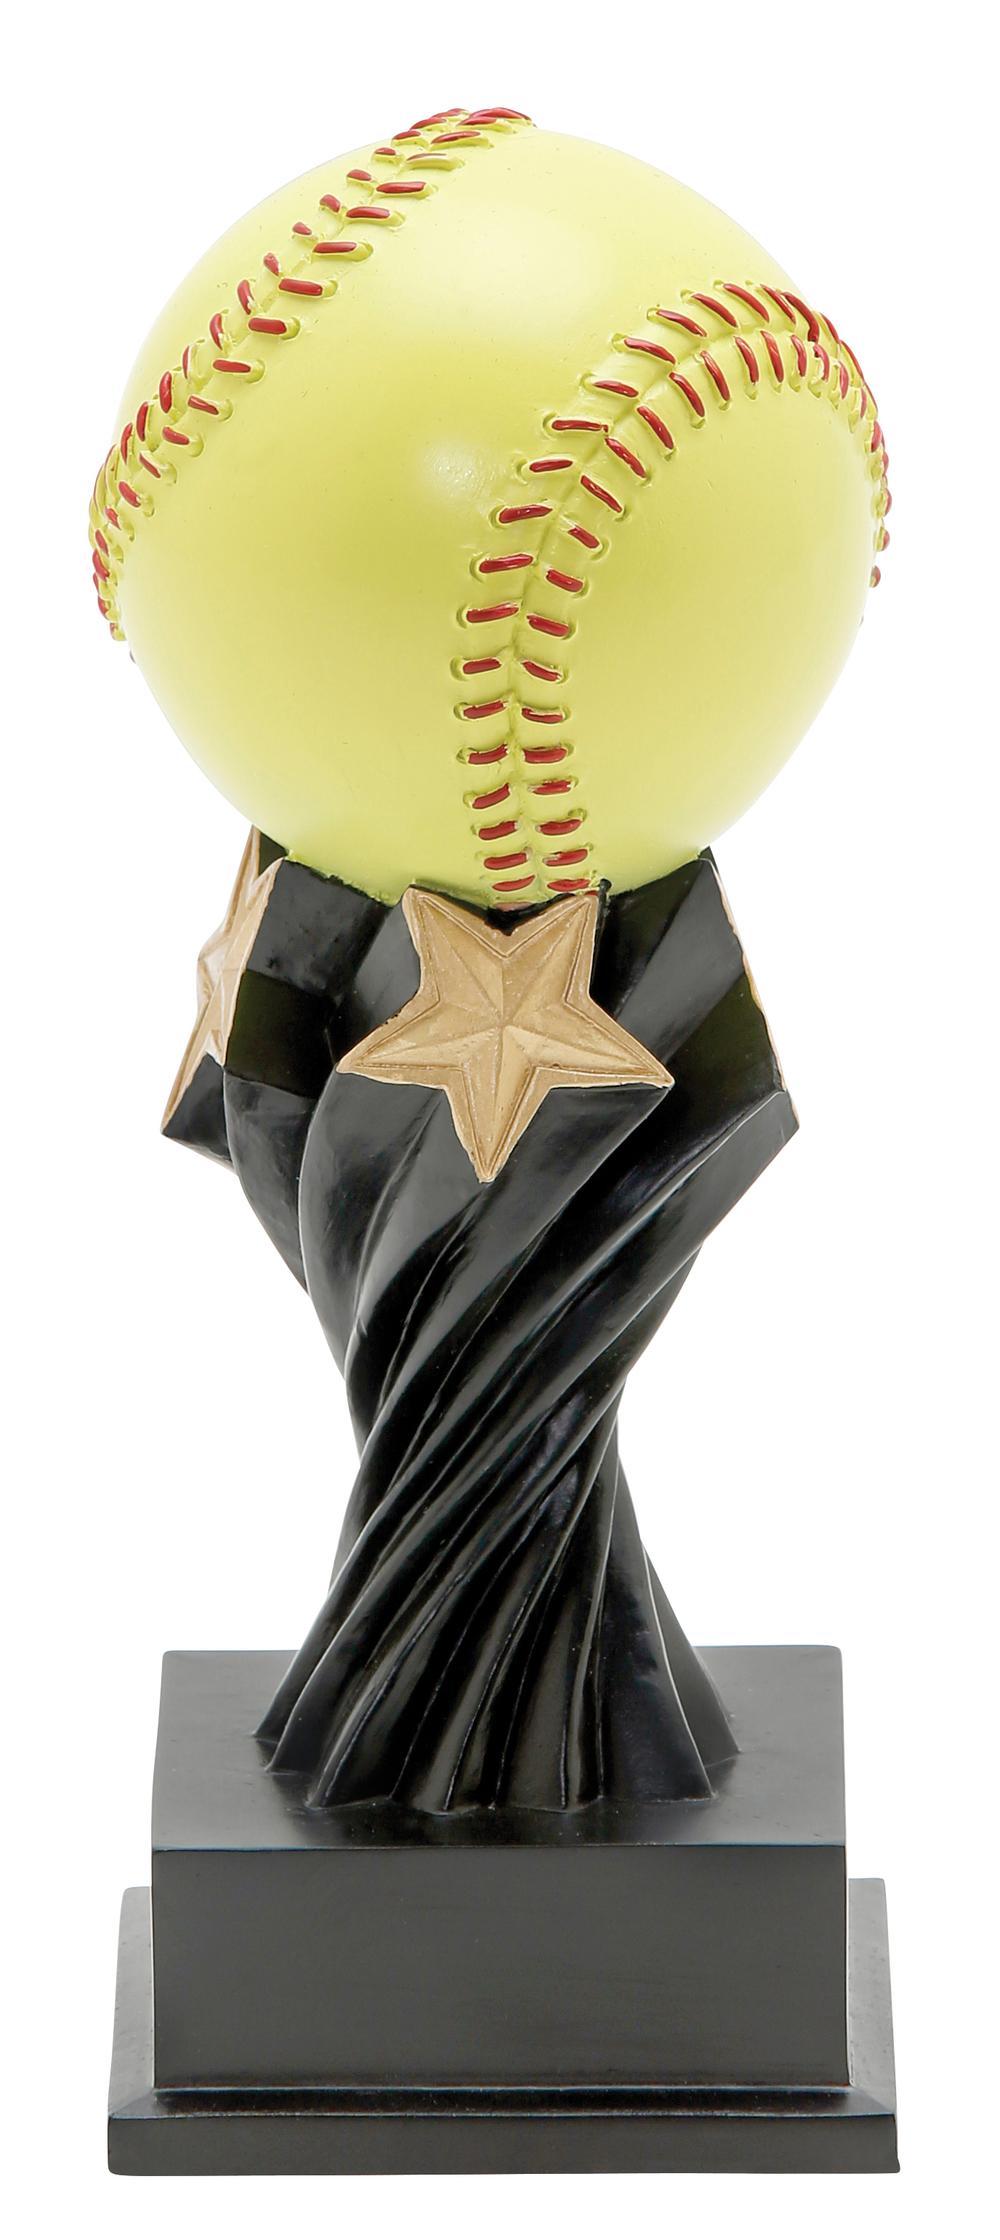 Softball   Large - 91420GS  Medium - 91320GS  Small - 91220GS